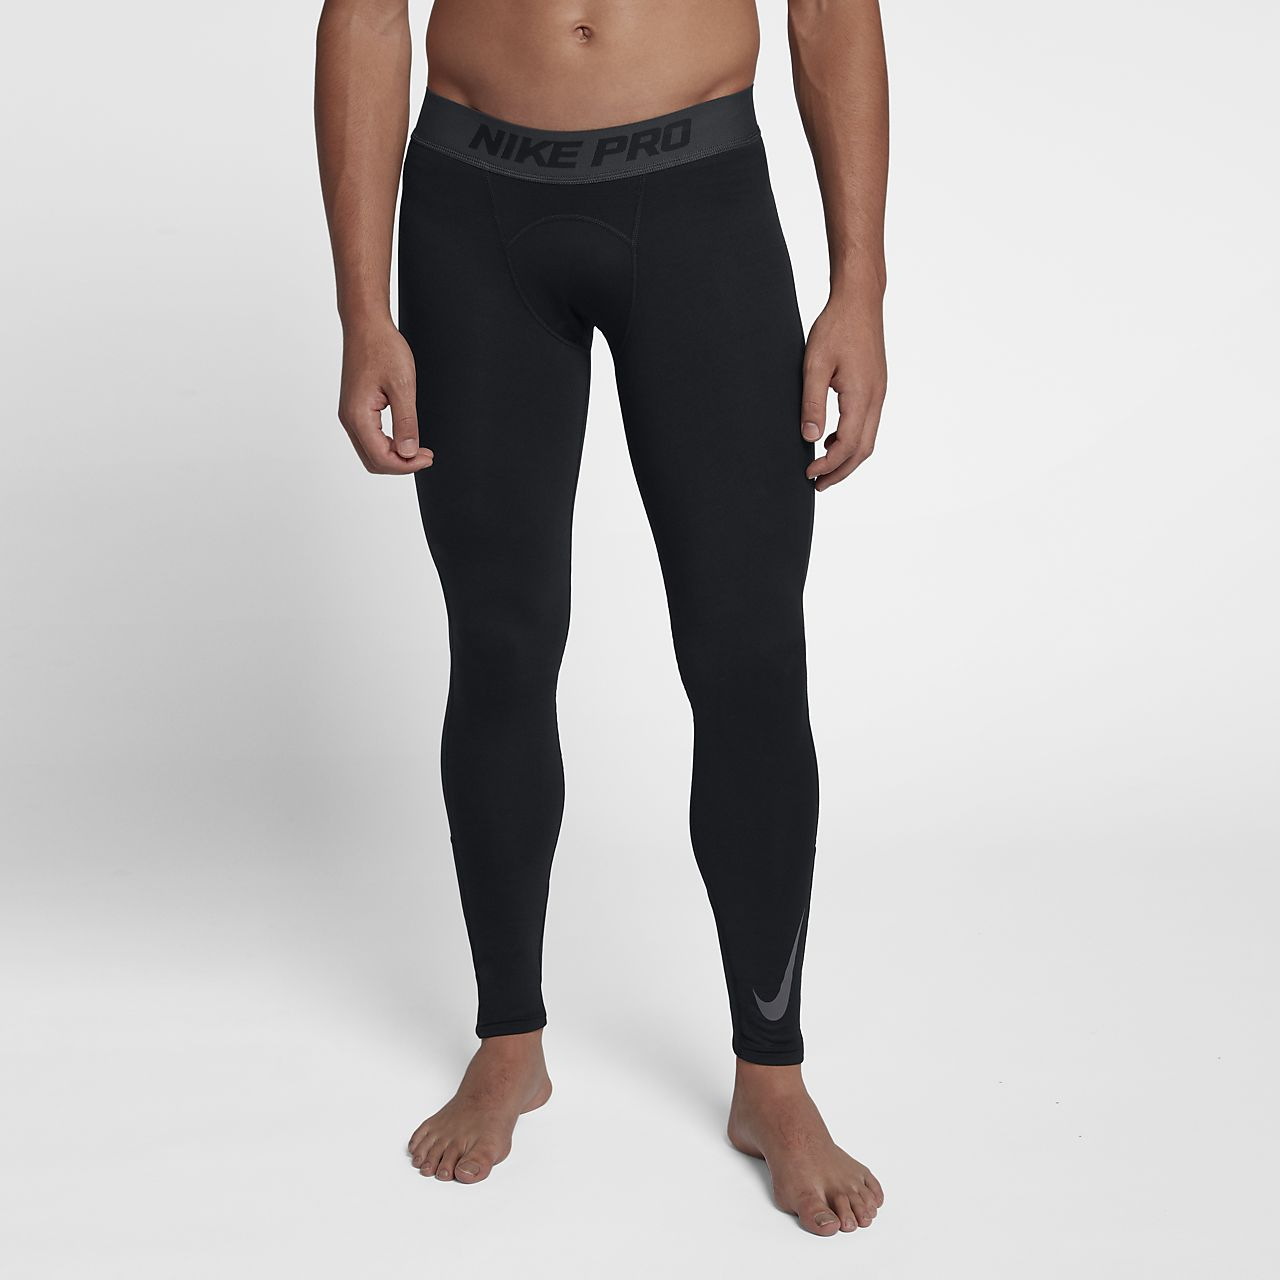 6d3fe0980ce Nike Pro Dri-FIT Therma Men's Tights. Nike.com GB